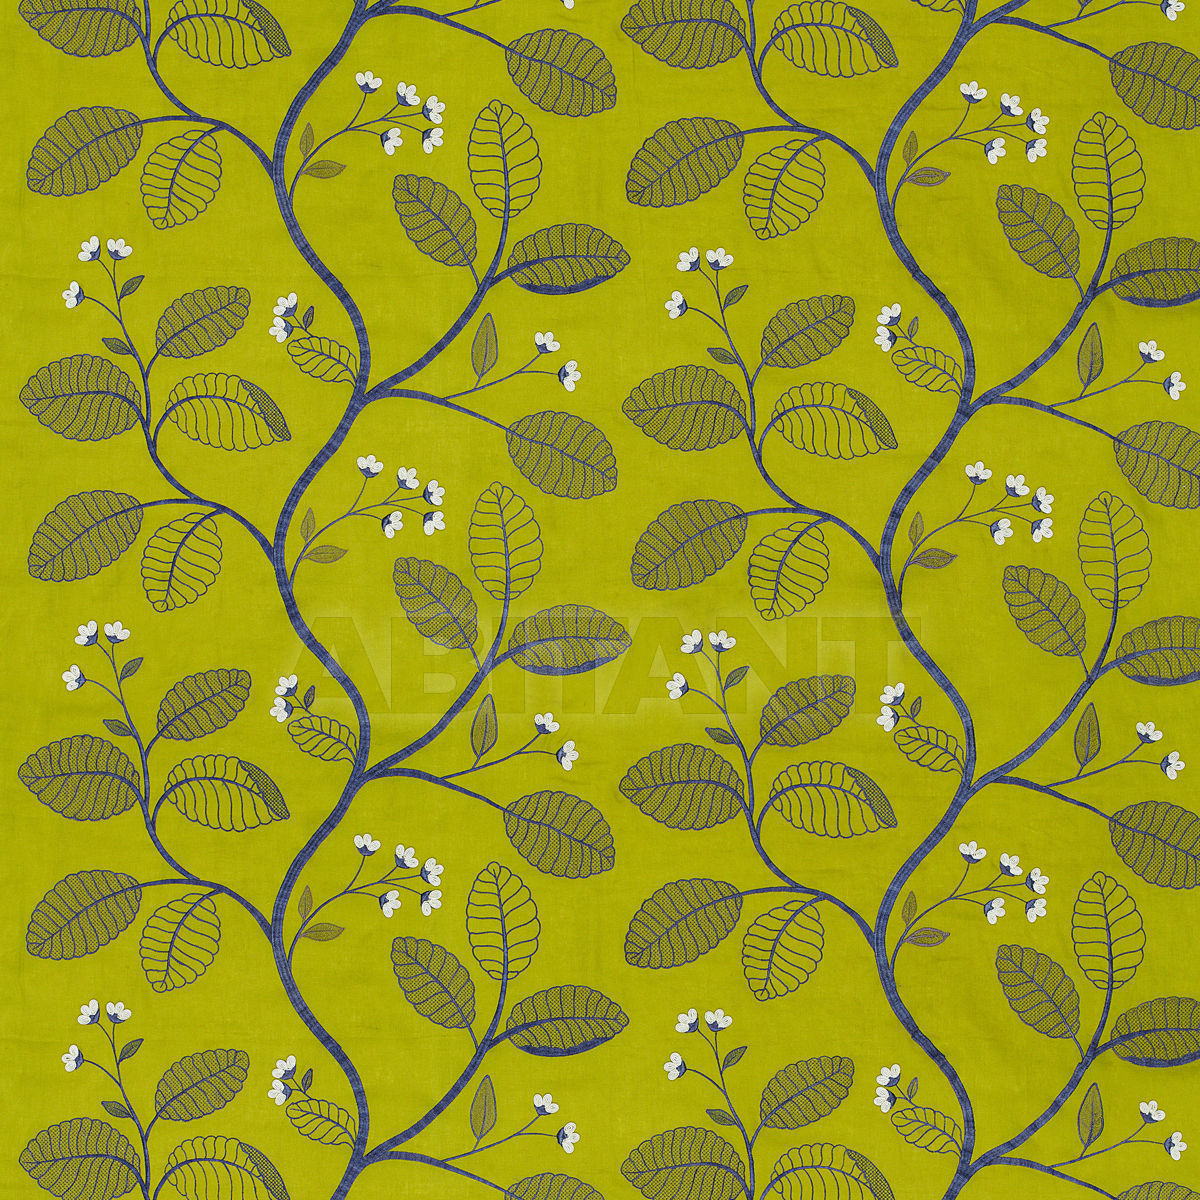 Купить Интерьерная ткань CELIA VINE Anna French Aria AW1379